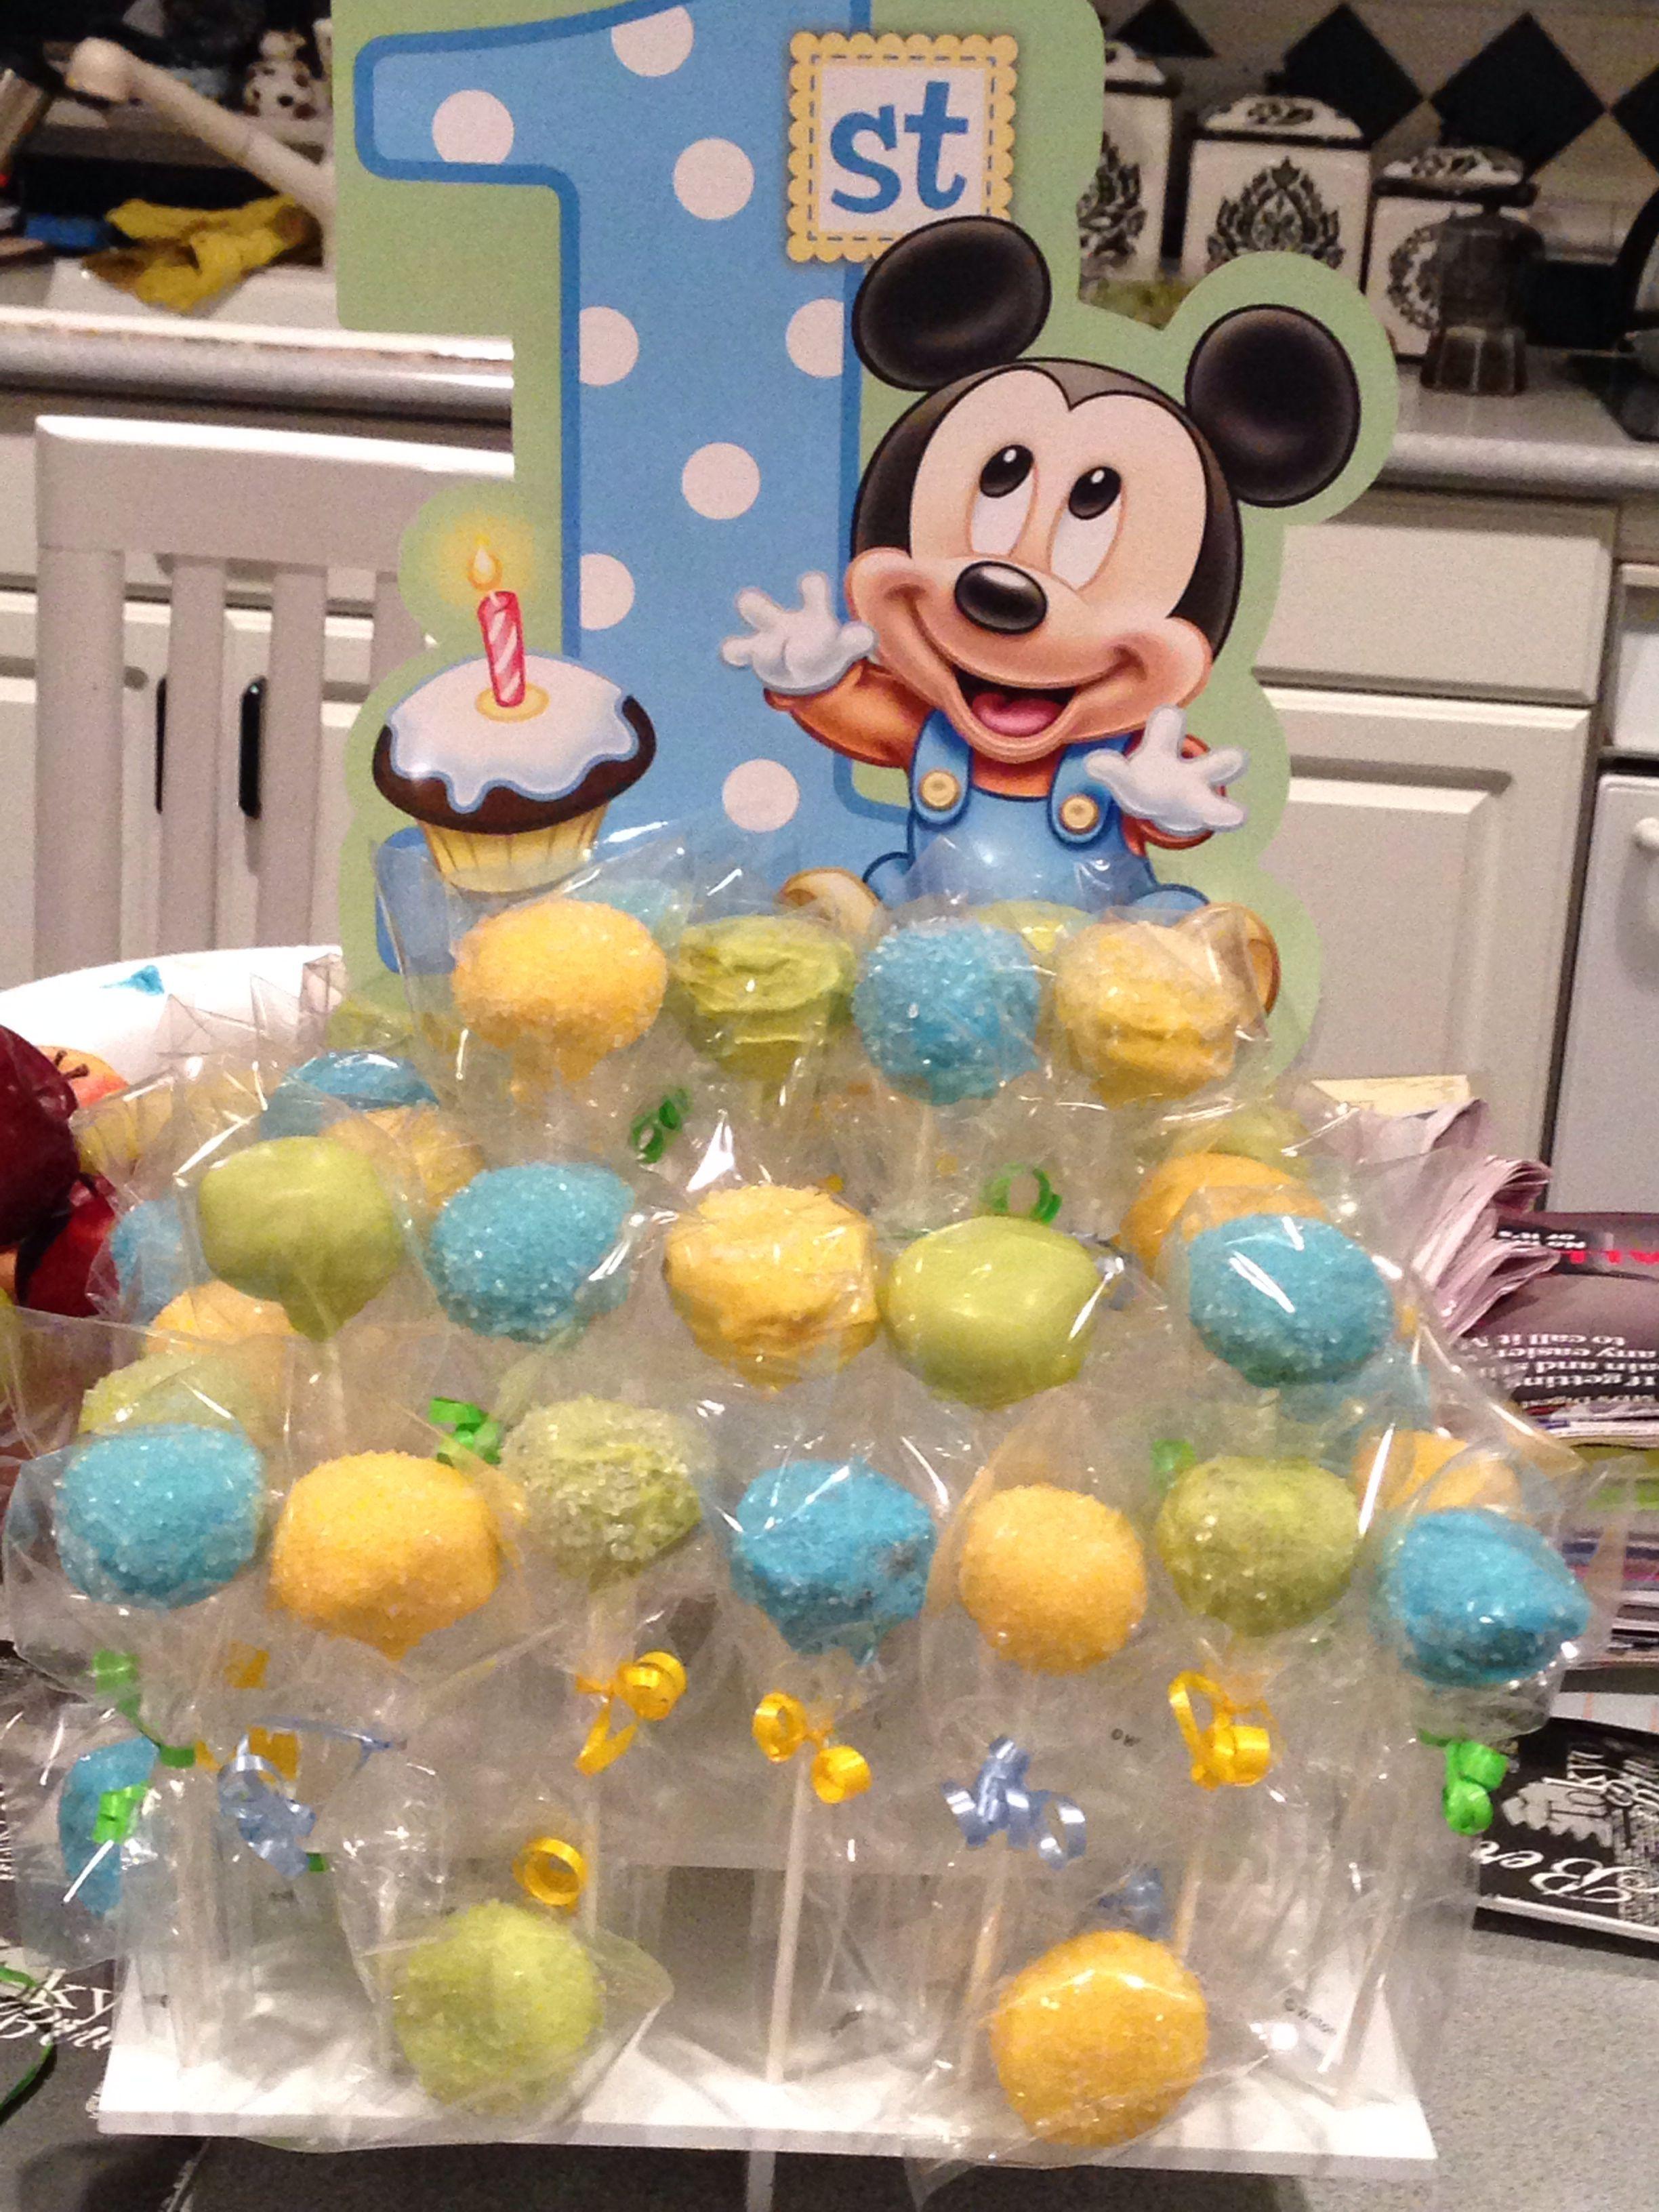 Baby mickey mouse birthday cake pops mickey pinterest baby erster geburtstag erste - Cake pops 50 geburtstag ...